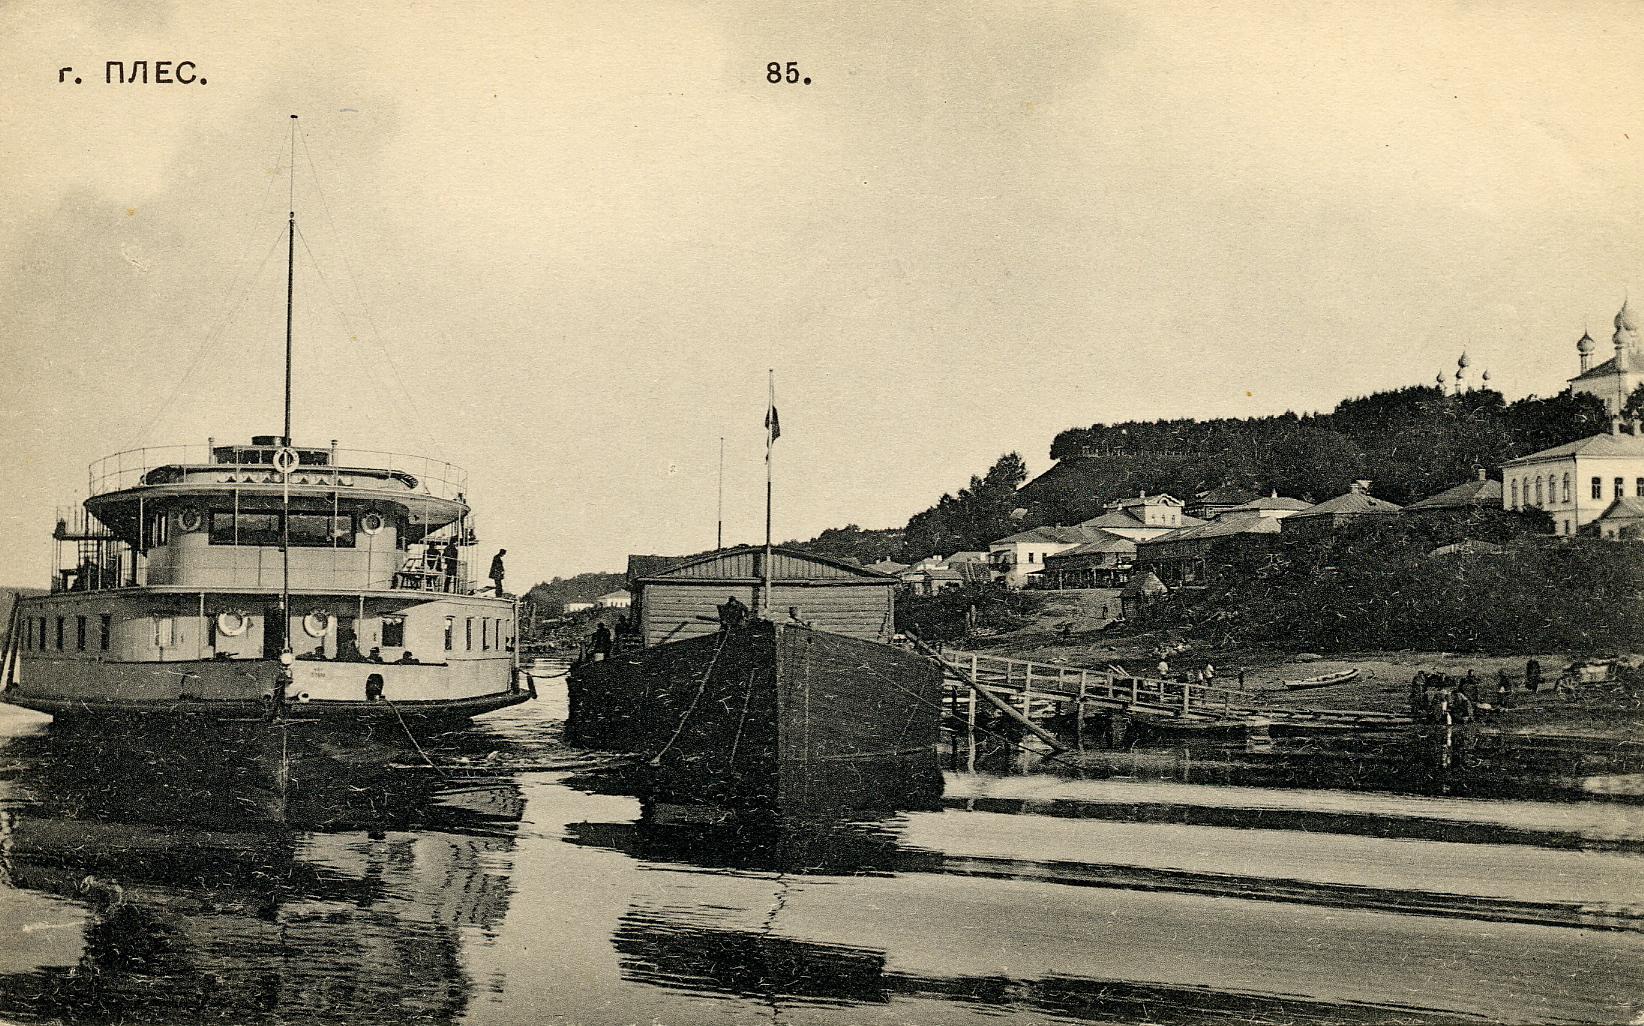 Пароход на стоянке у плесской пристани